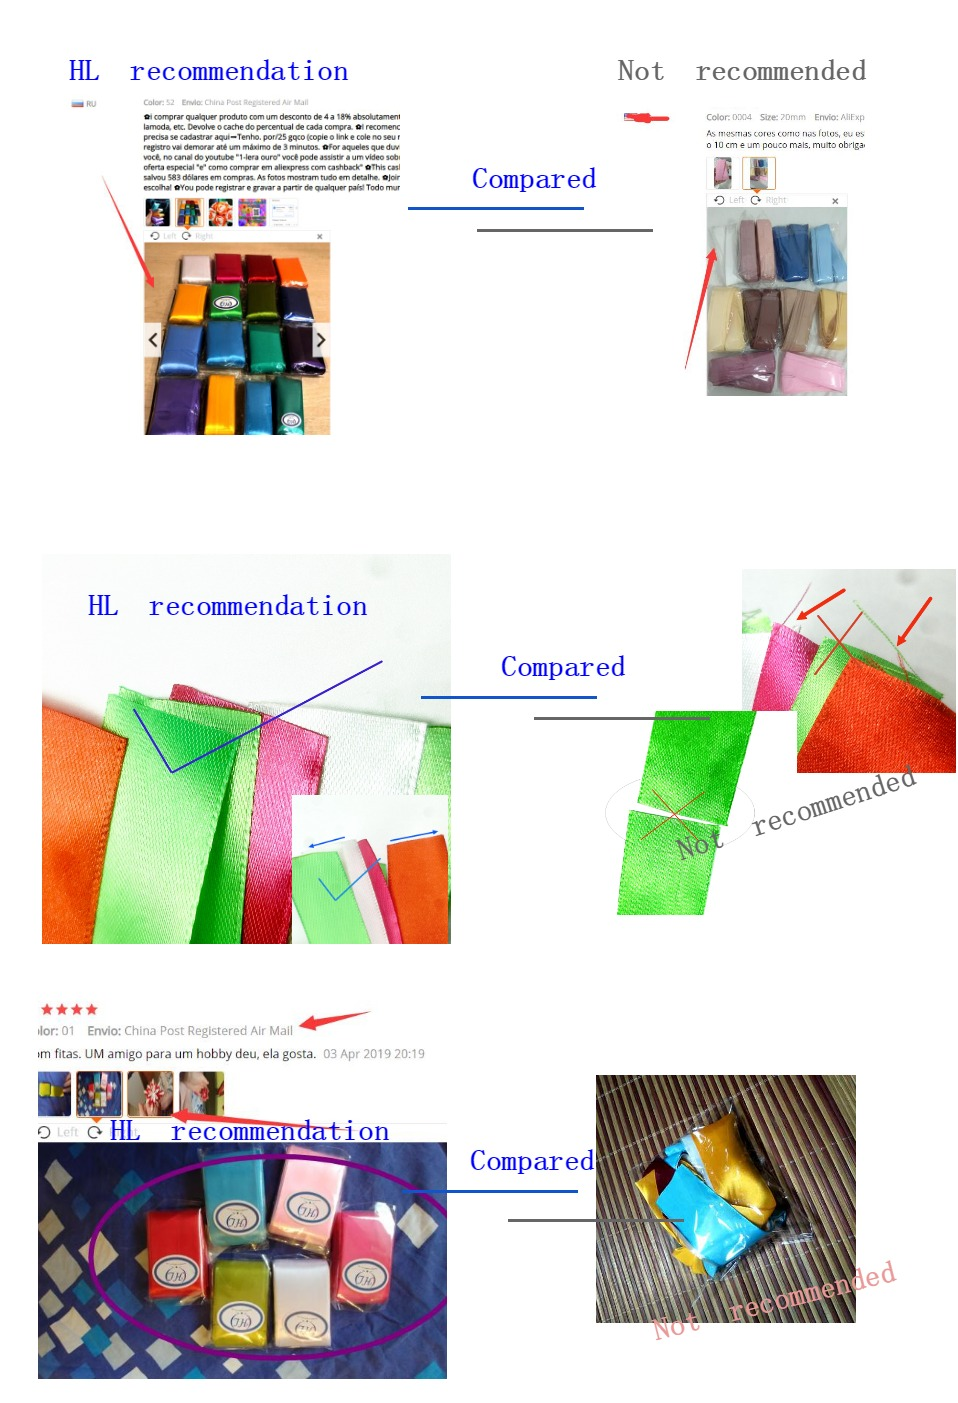 Hf5190d0ac763445c82aad481c265e239n HL 5 meters 15/20/25/40/50mm Solid Color Satin Ribbons Wedding Decorative Gift Box Wrapping Belt DIY Crafts